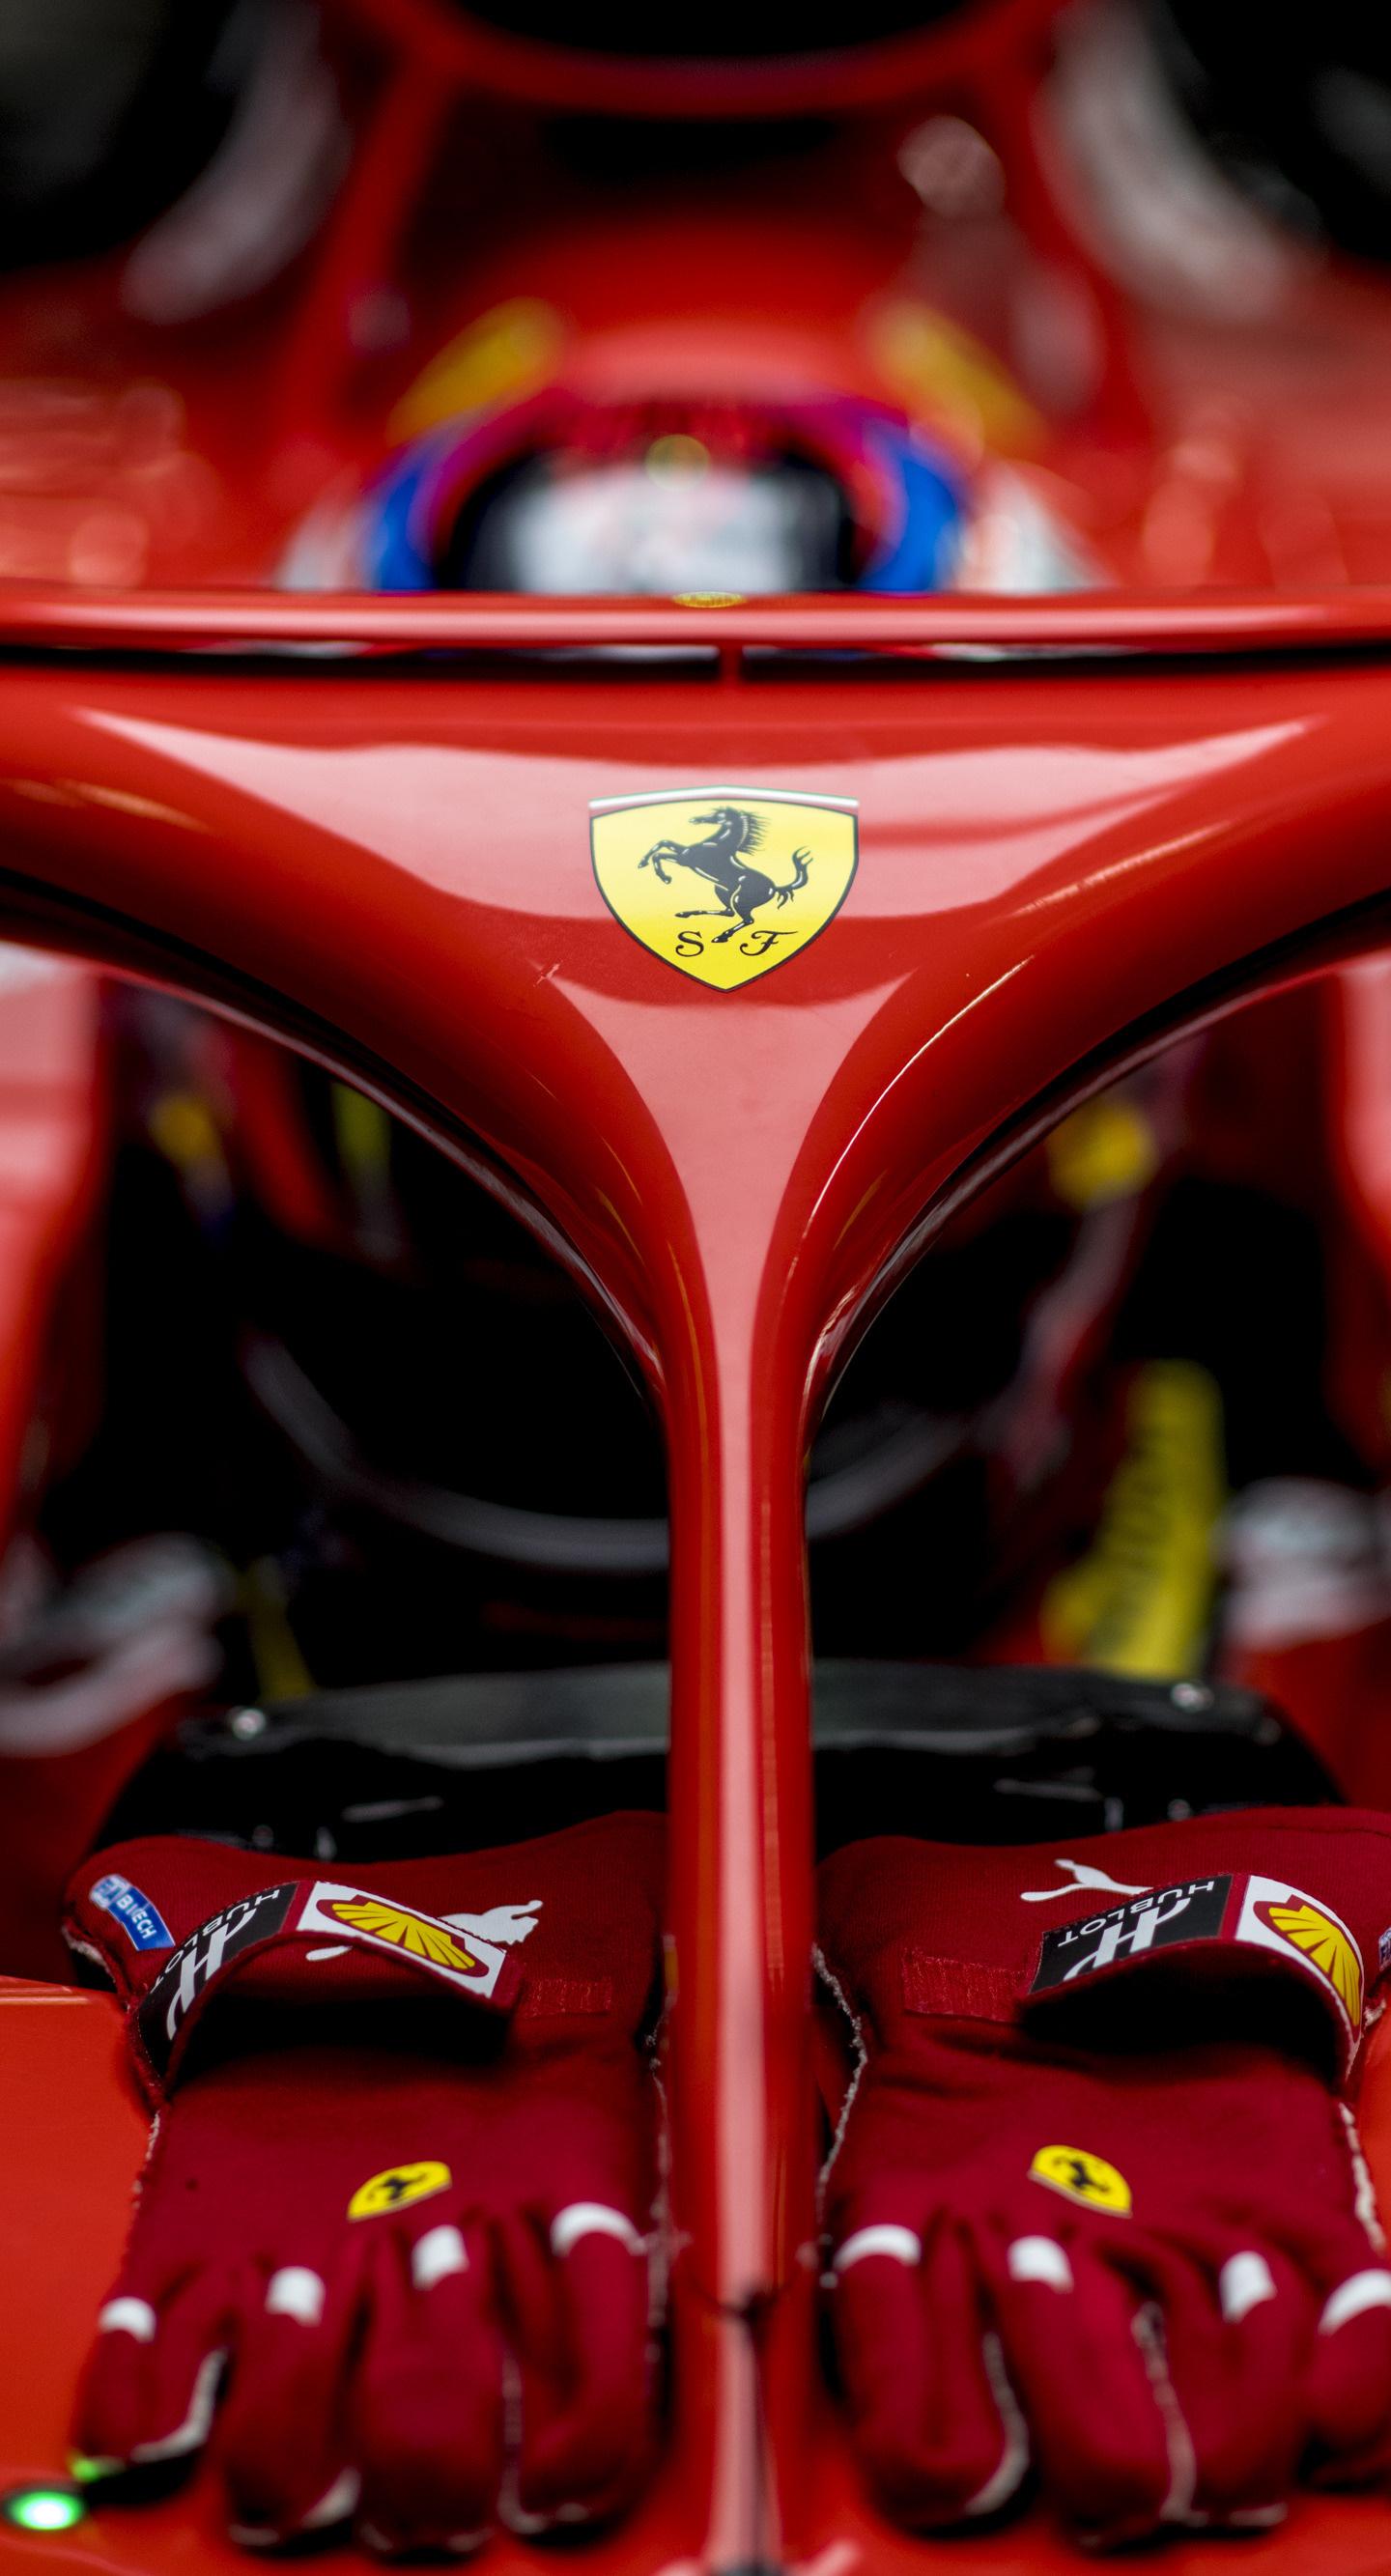 25 Ferrari F1 Wallpapers On Wallpapersafari